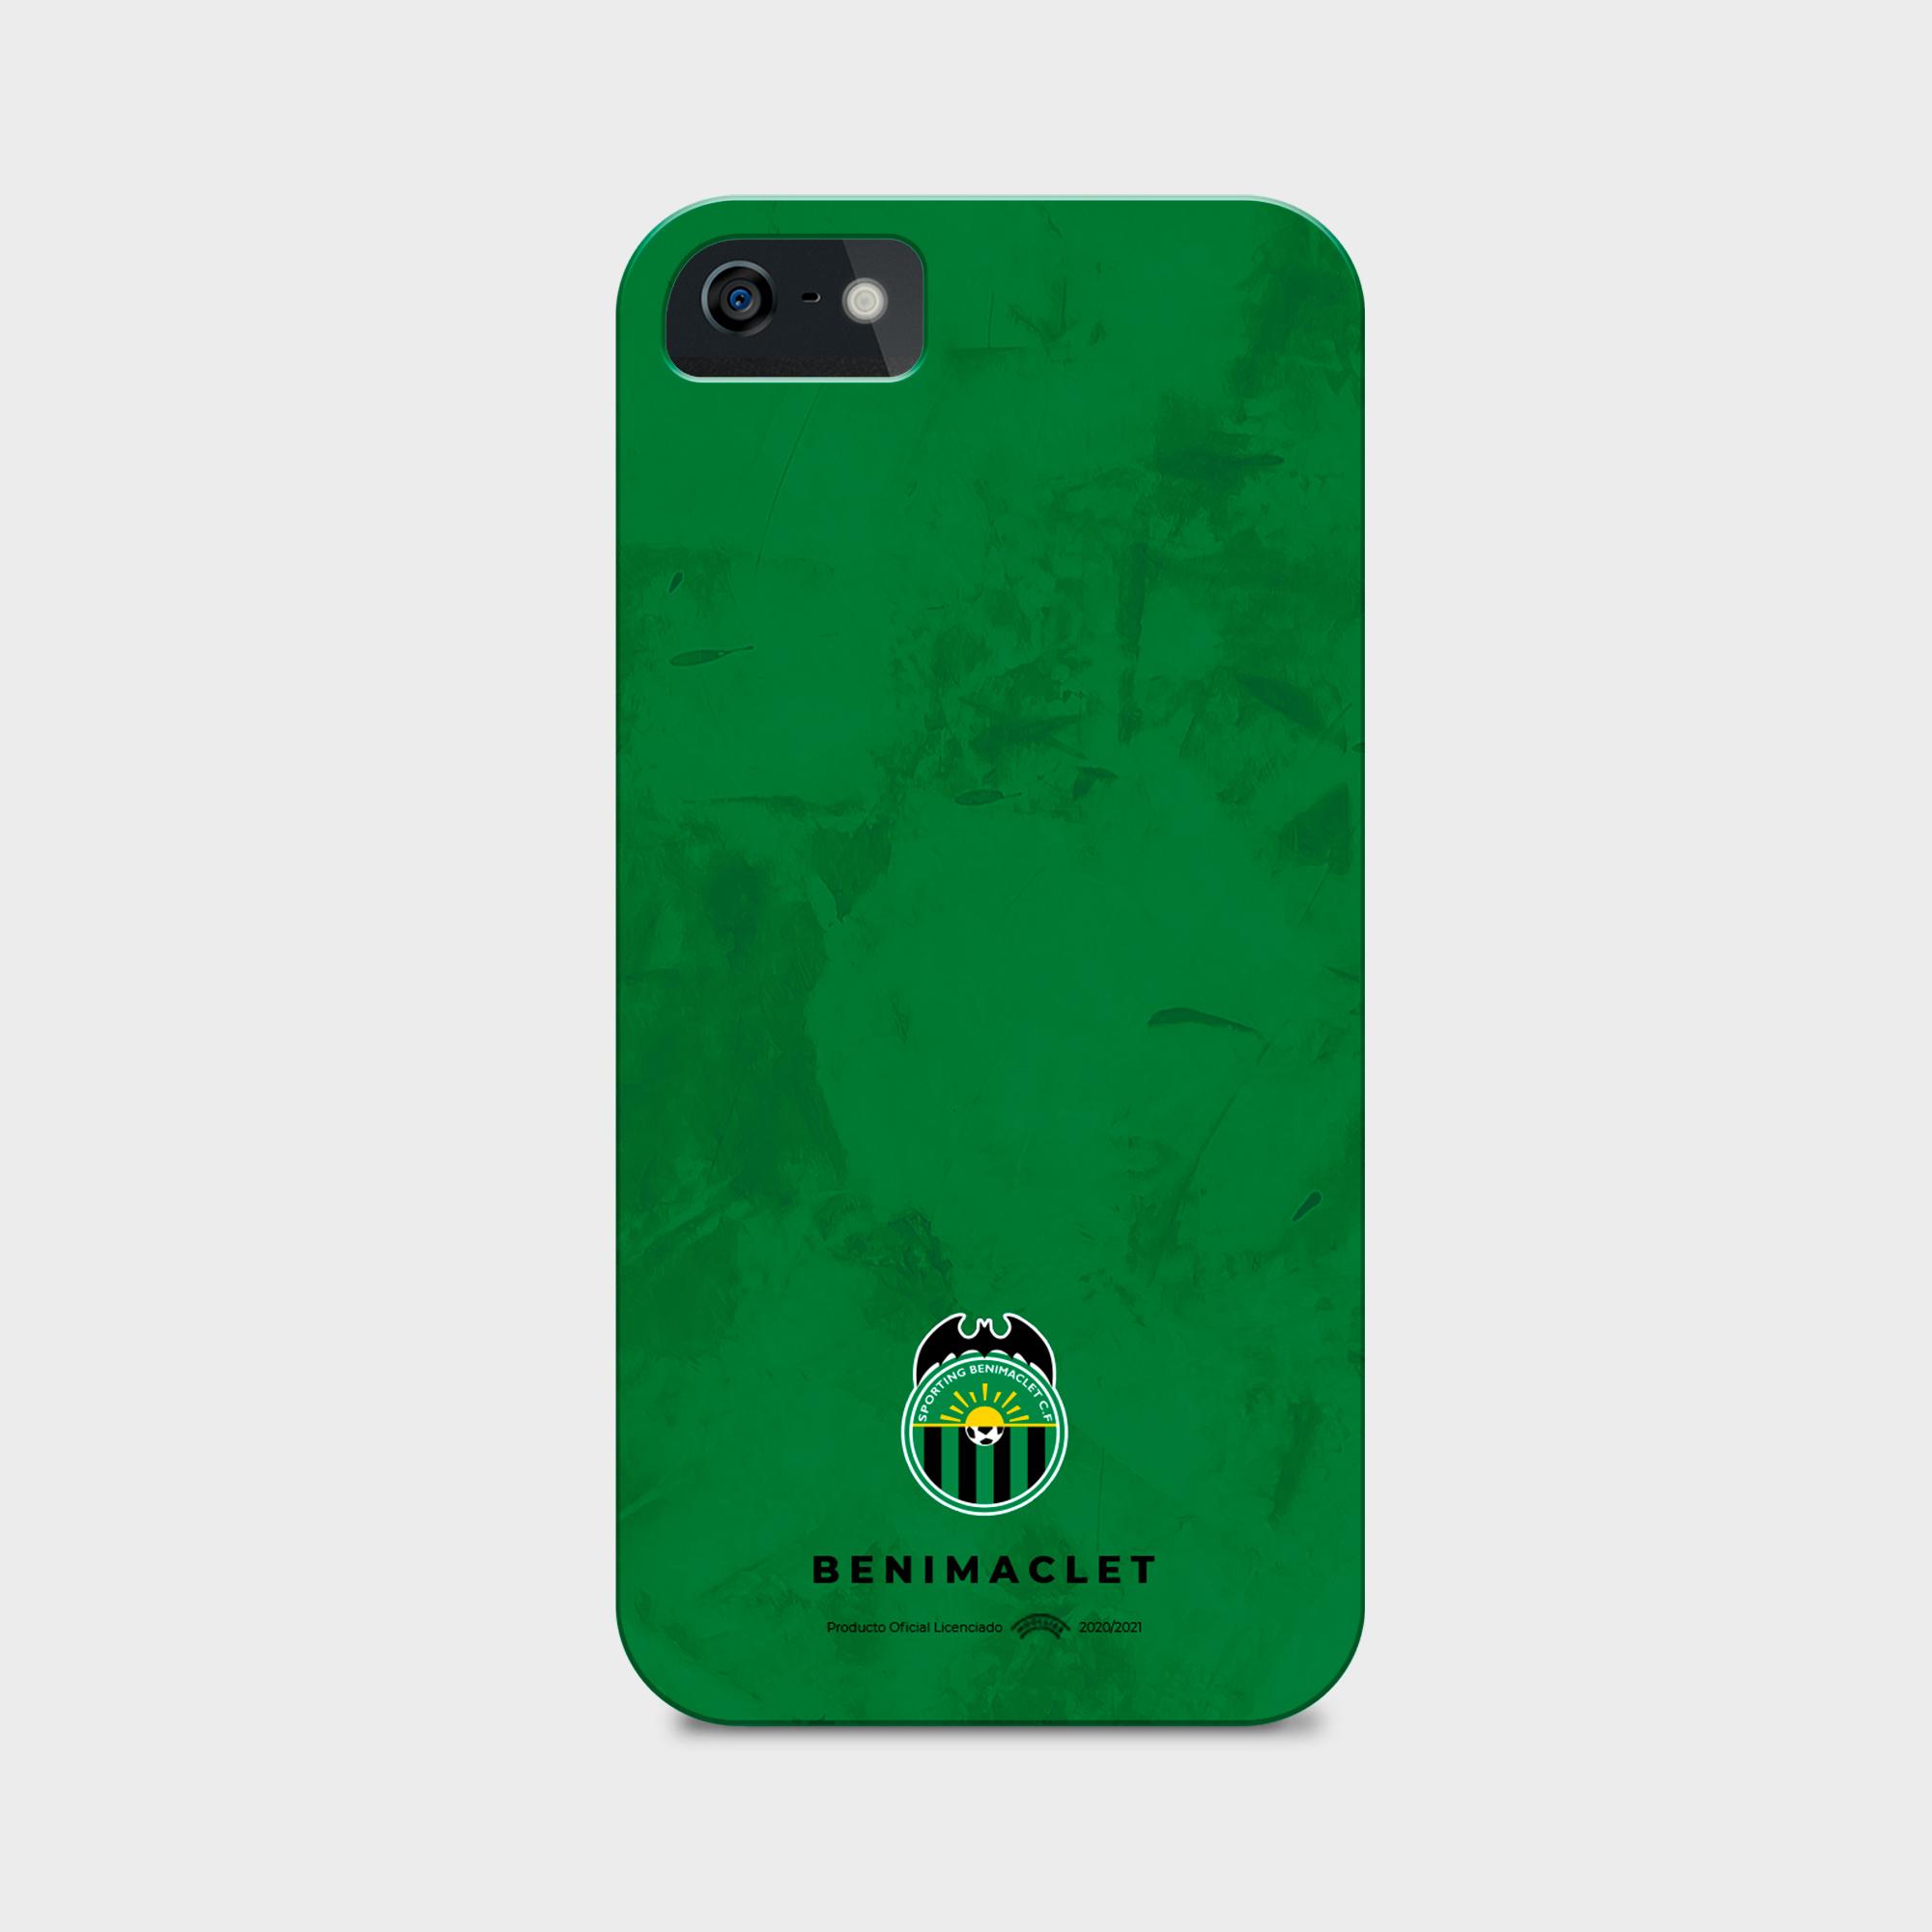 spbenimaclet-concrete-edition-FUNDA-MOVIL-green